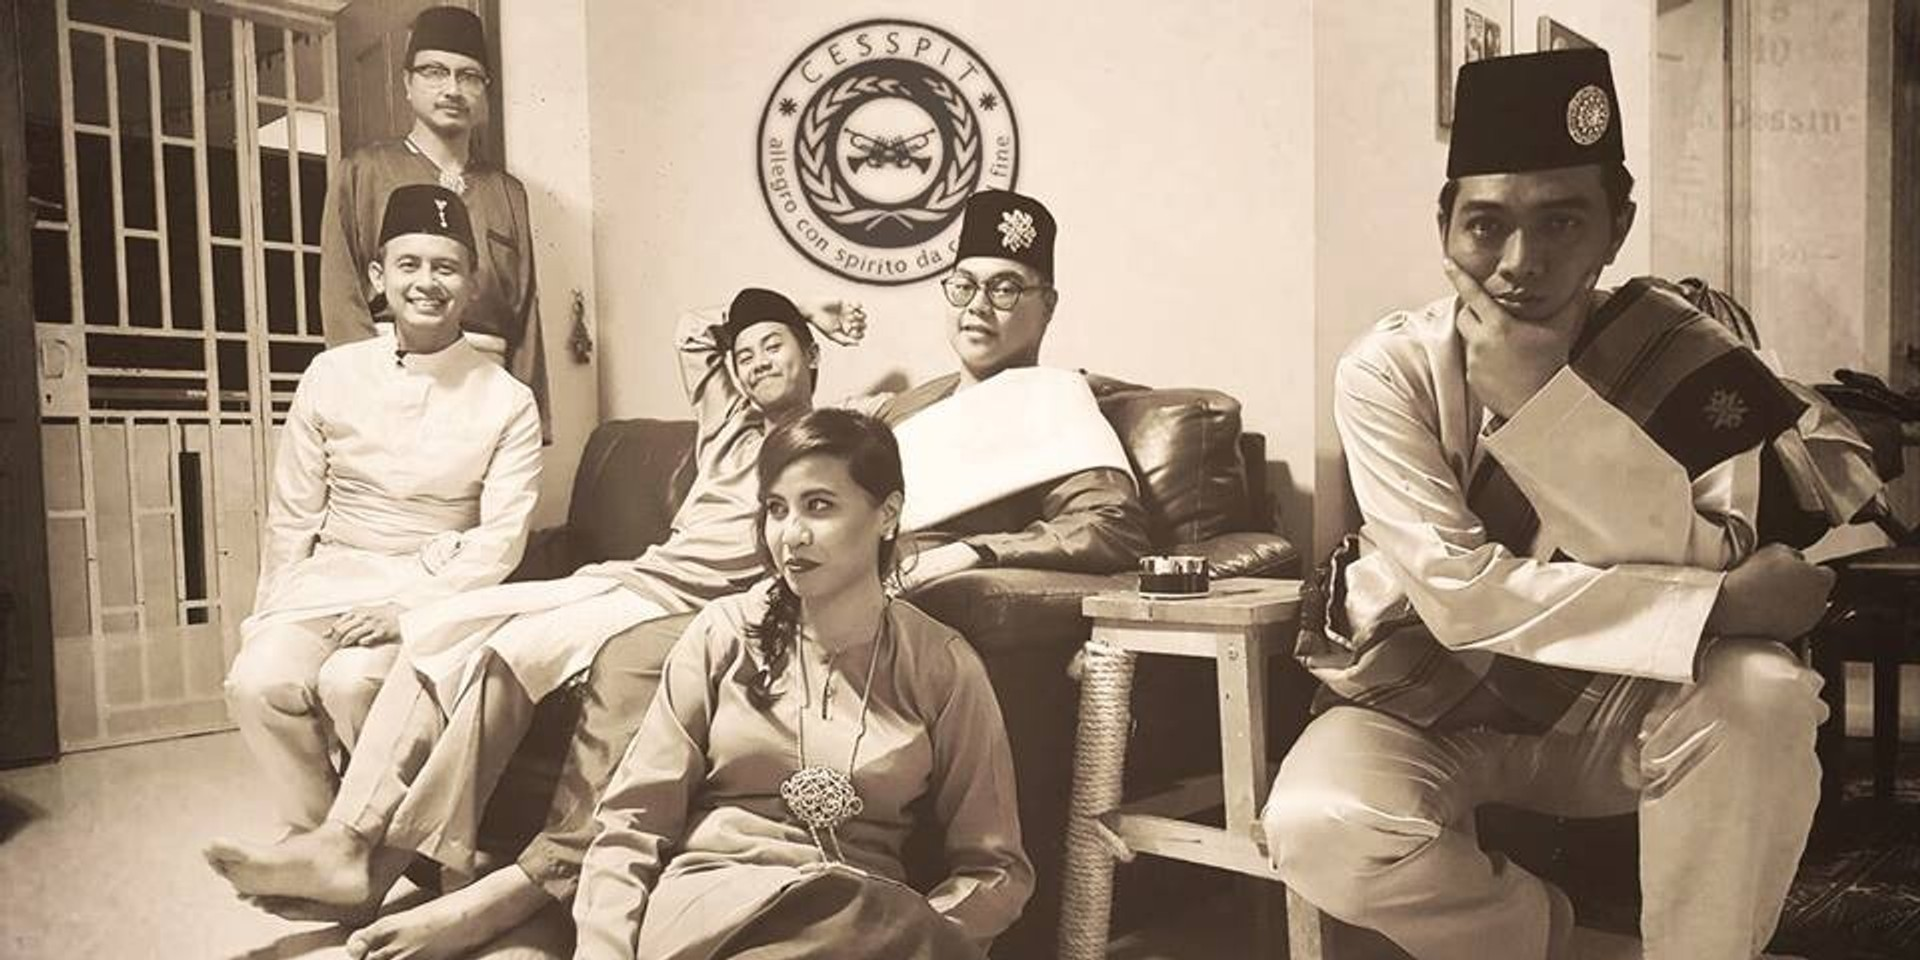 LISTEN: Hari Raya meets ska in Cesspit's joyous new single 'Raya Raya'